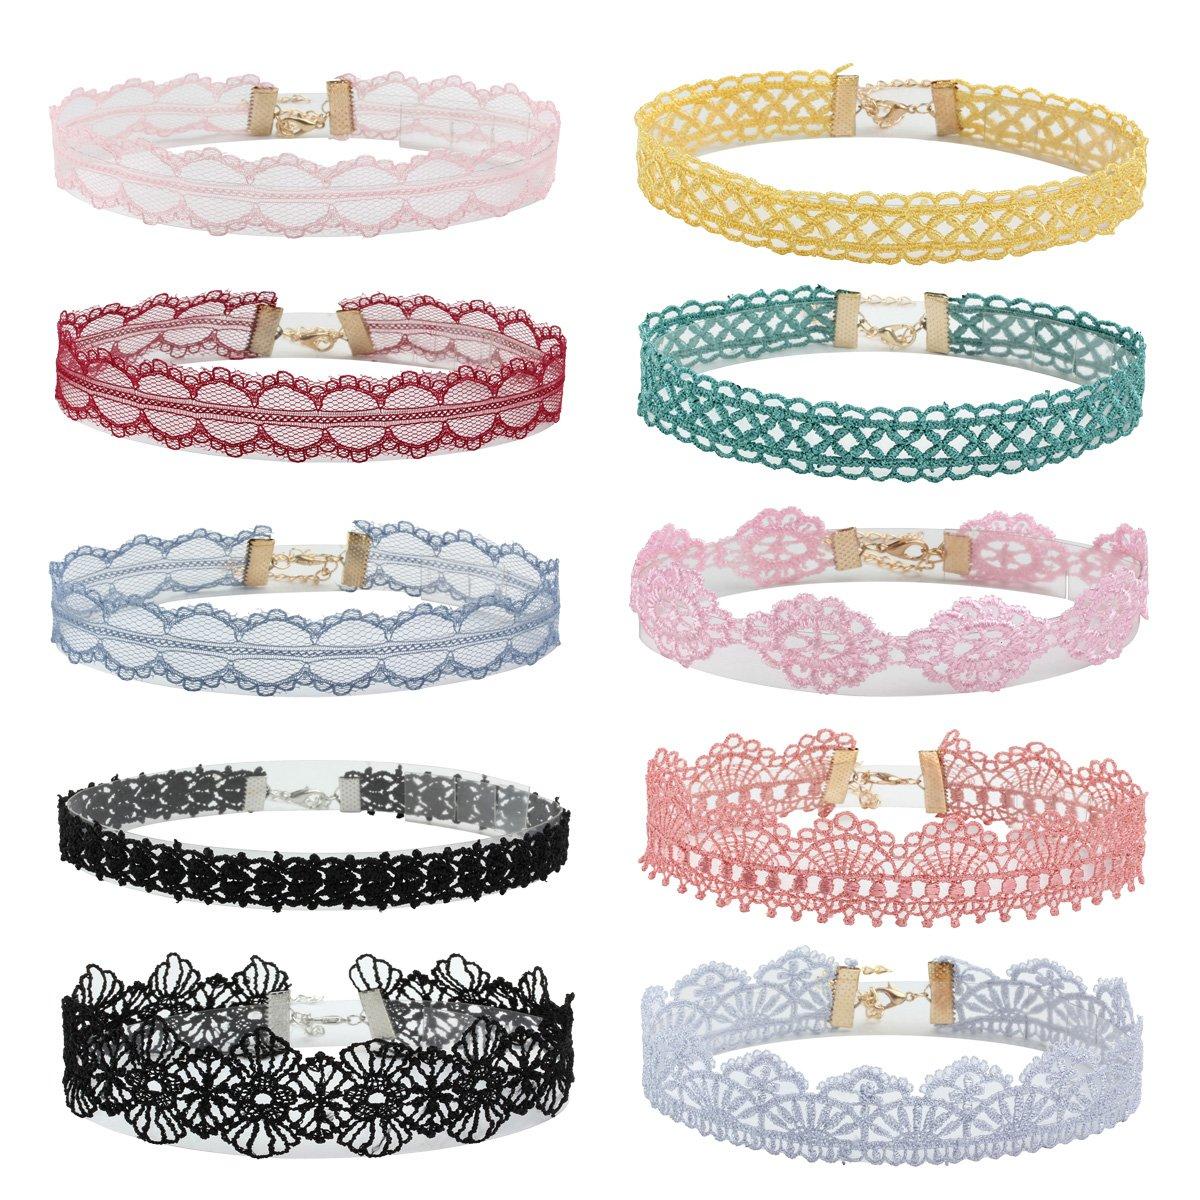 Eigso 2-30Pcs Girls Womens Velvet Ribbon Necklace Set Gothic Tattoo Lace Adjustable Choker B07996RF9L_US